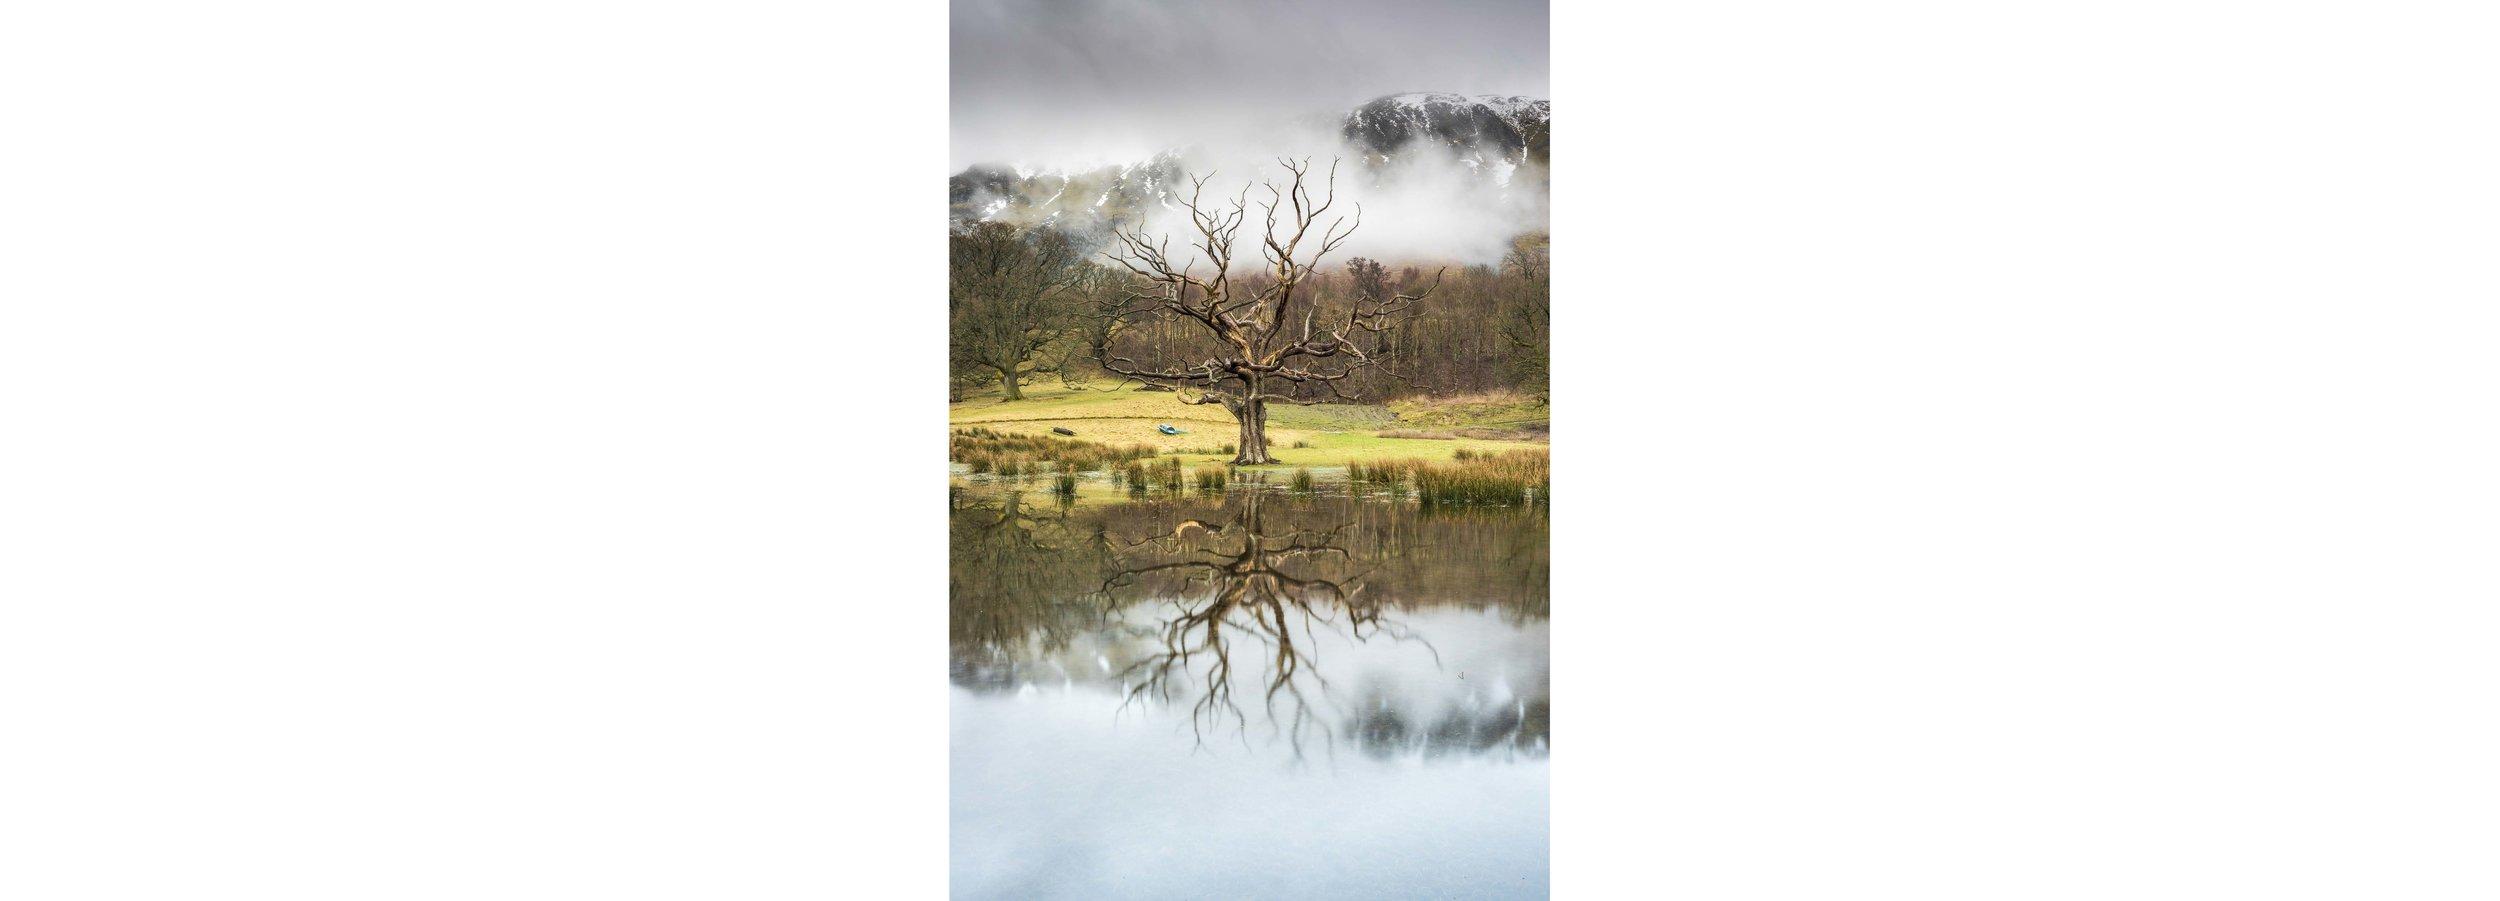 The Barren Tree Full Width.jpg